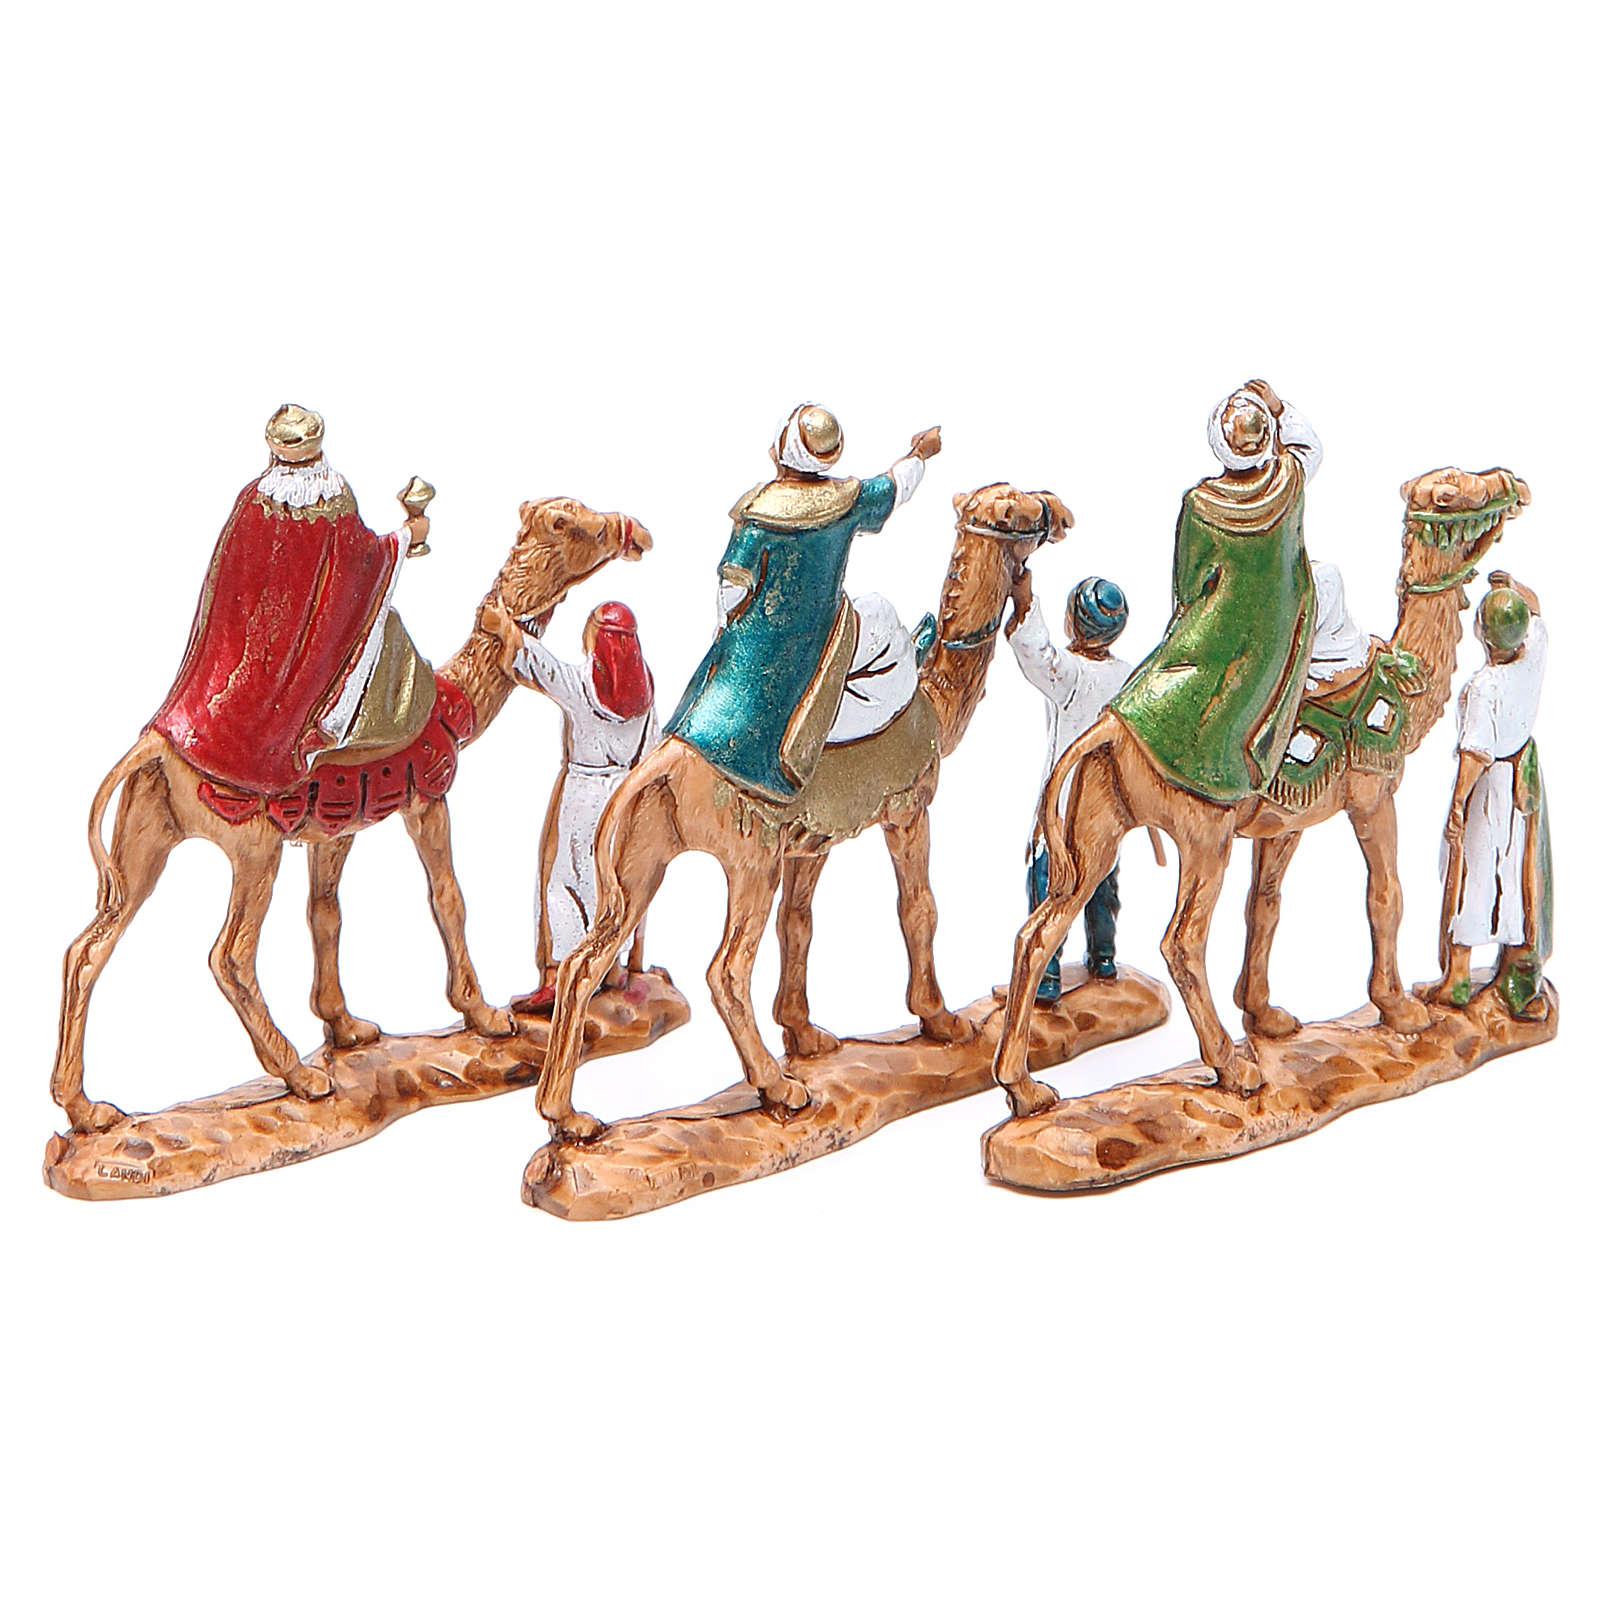 Re Magi e cammelli 3,5 cm Moranduzzo 3pezzi 4